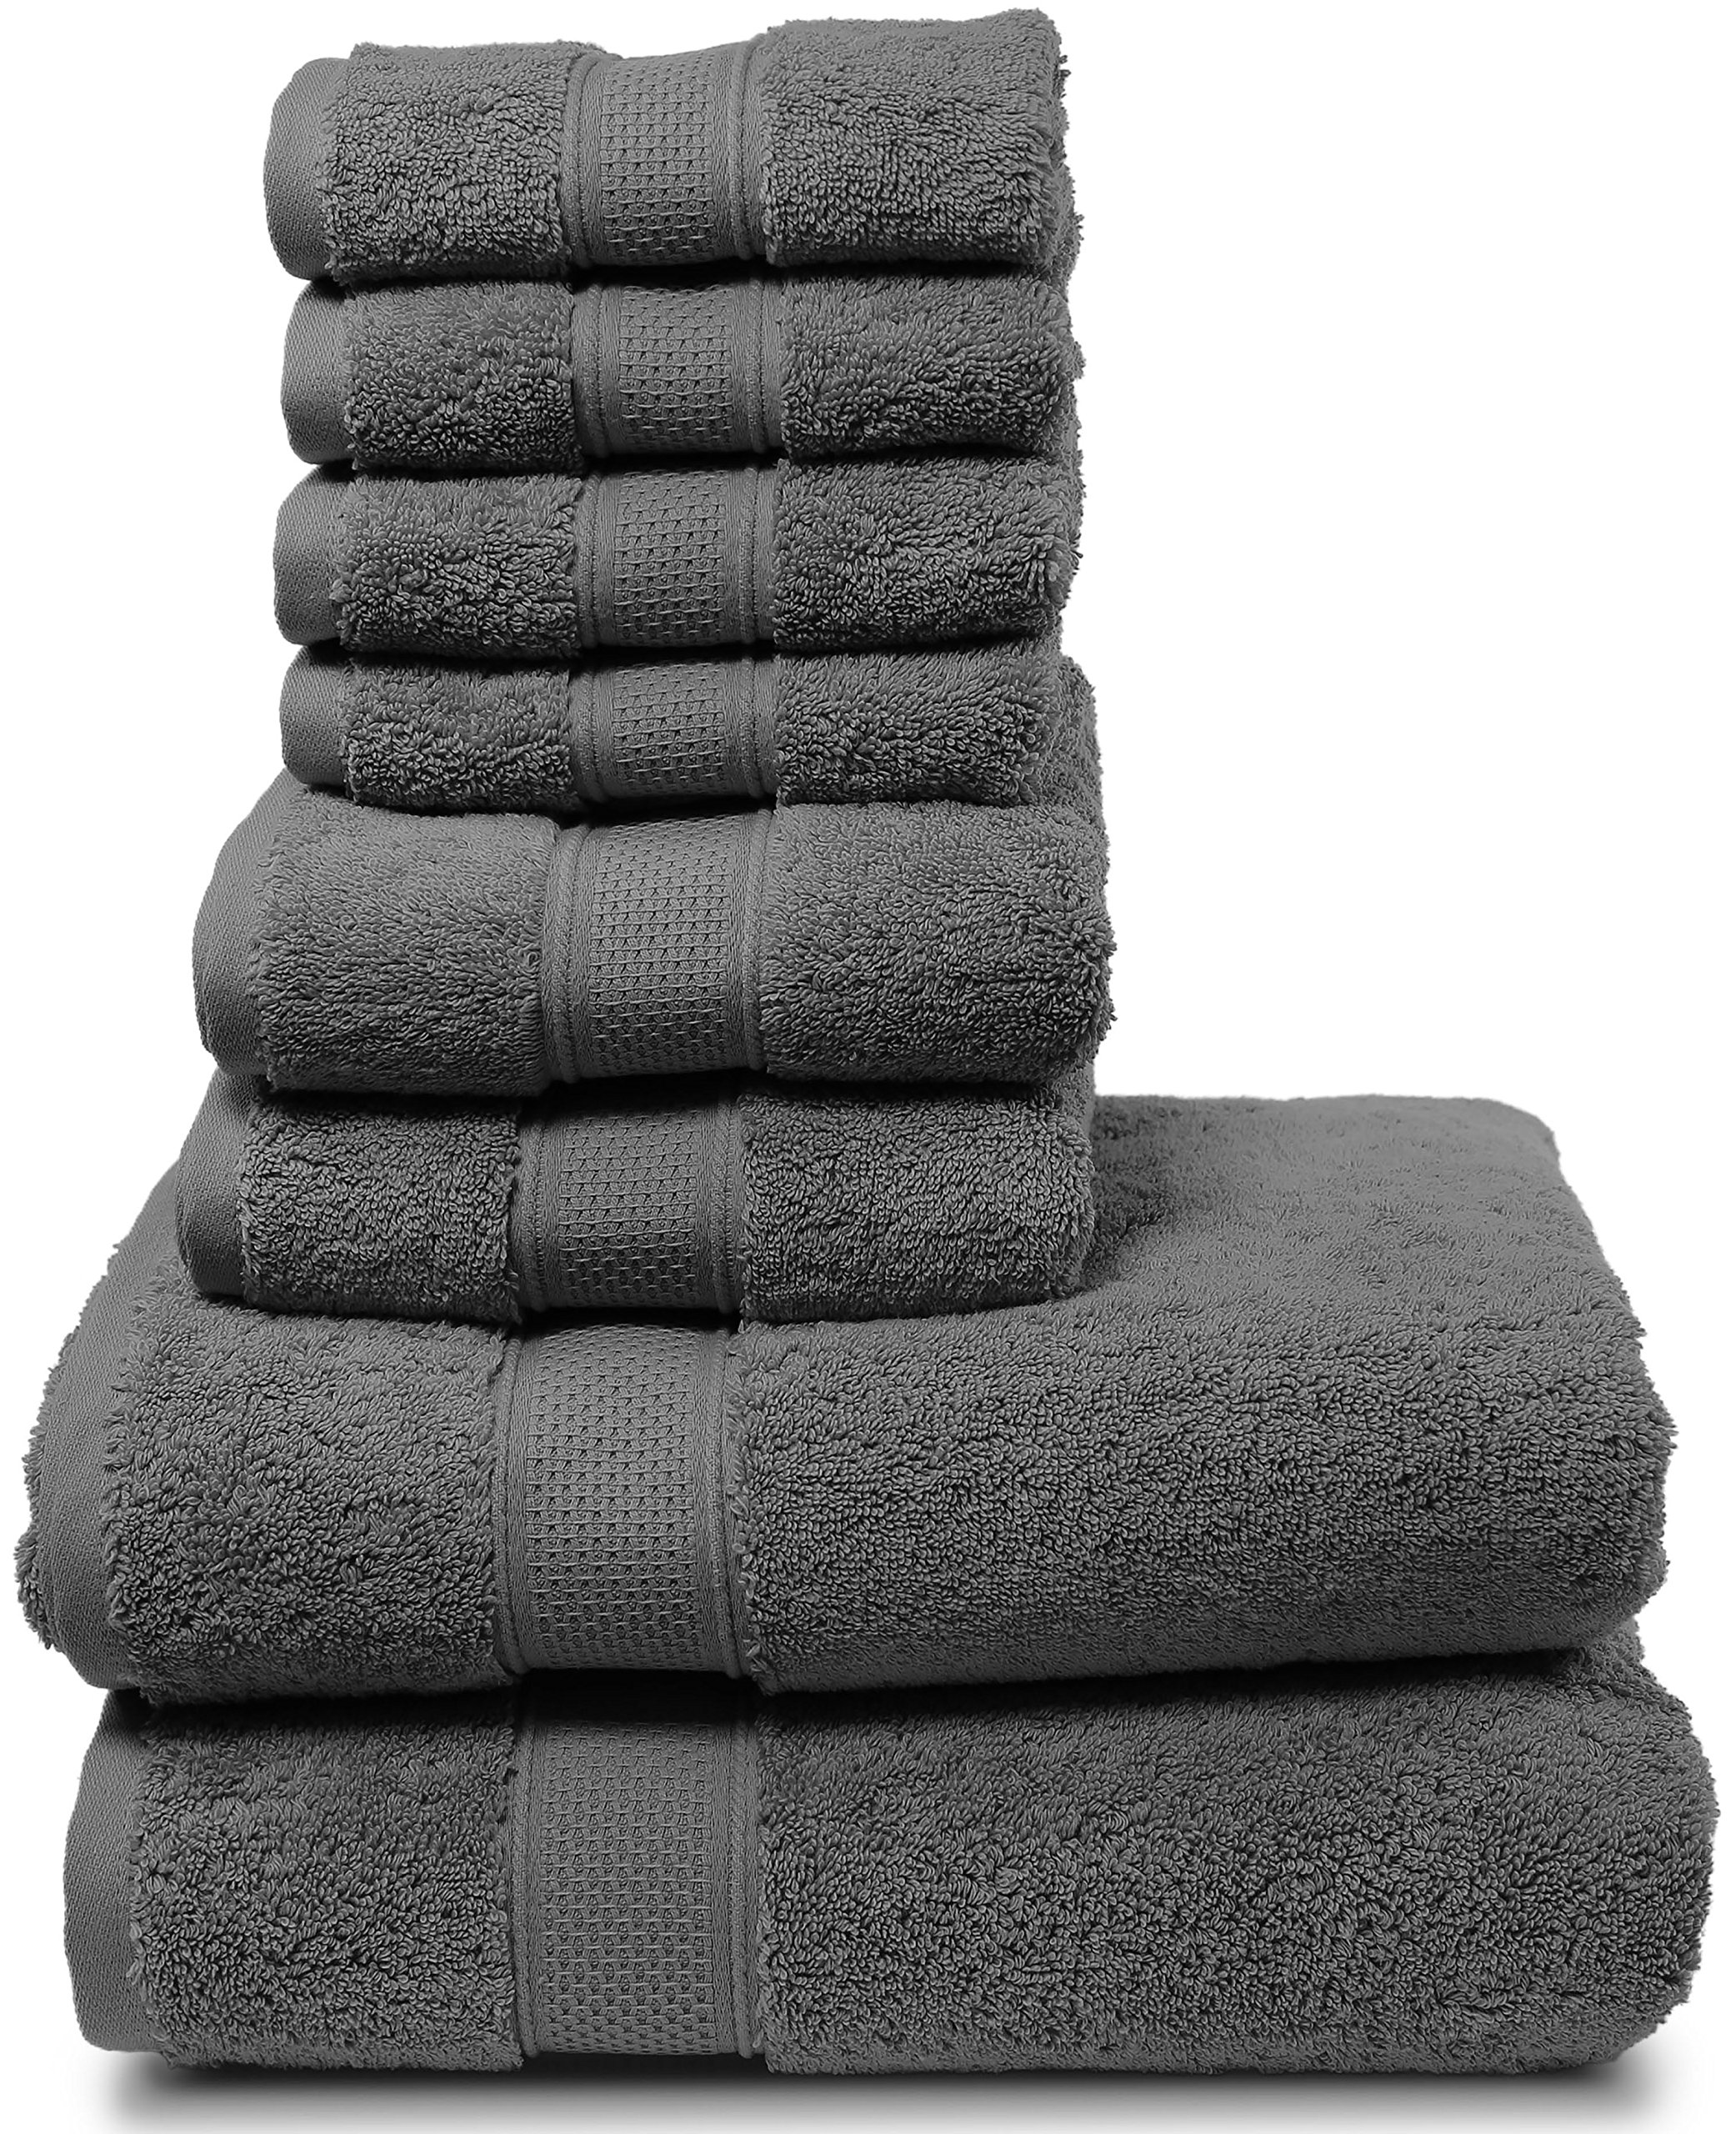 Luxury Bath Towel Set. Hotel & Spa Quality. 2 Large